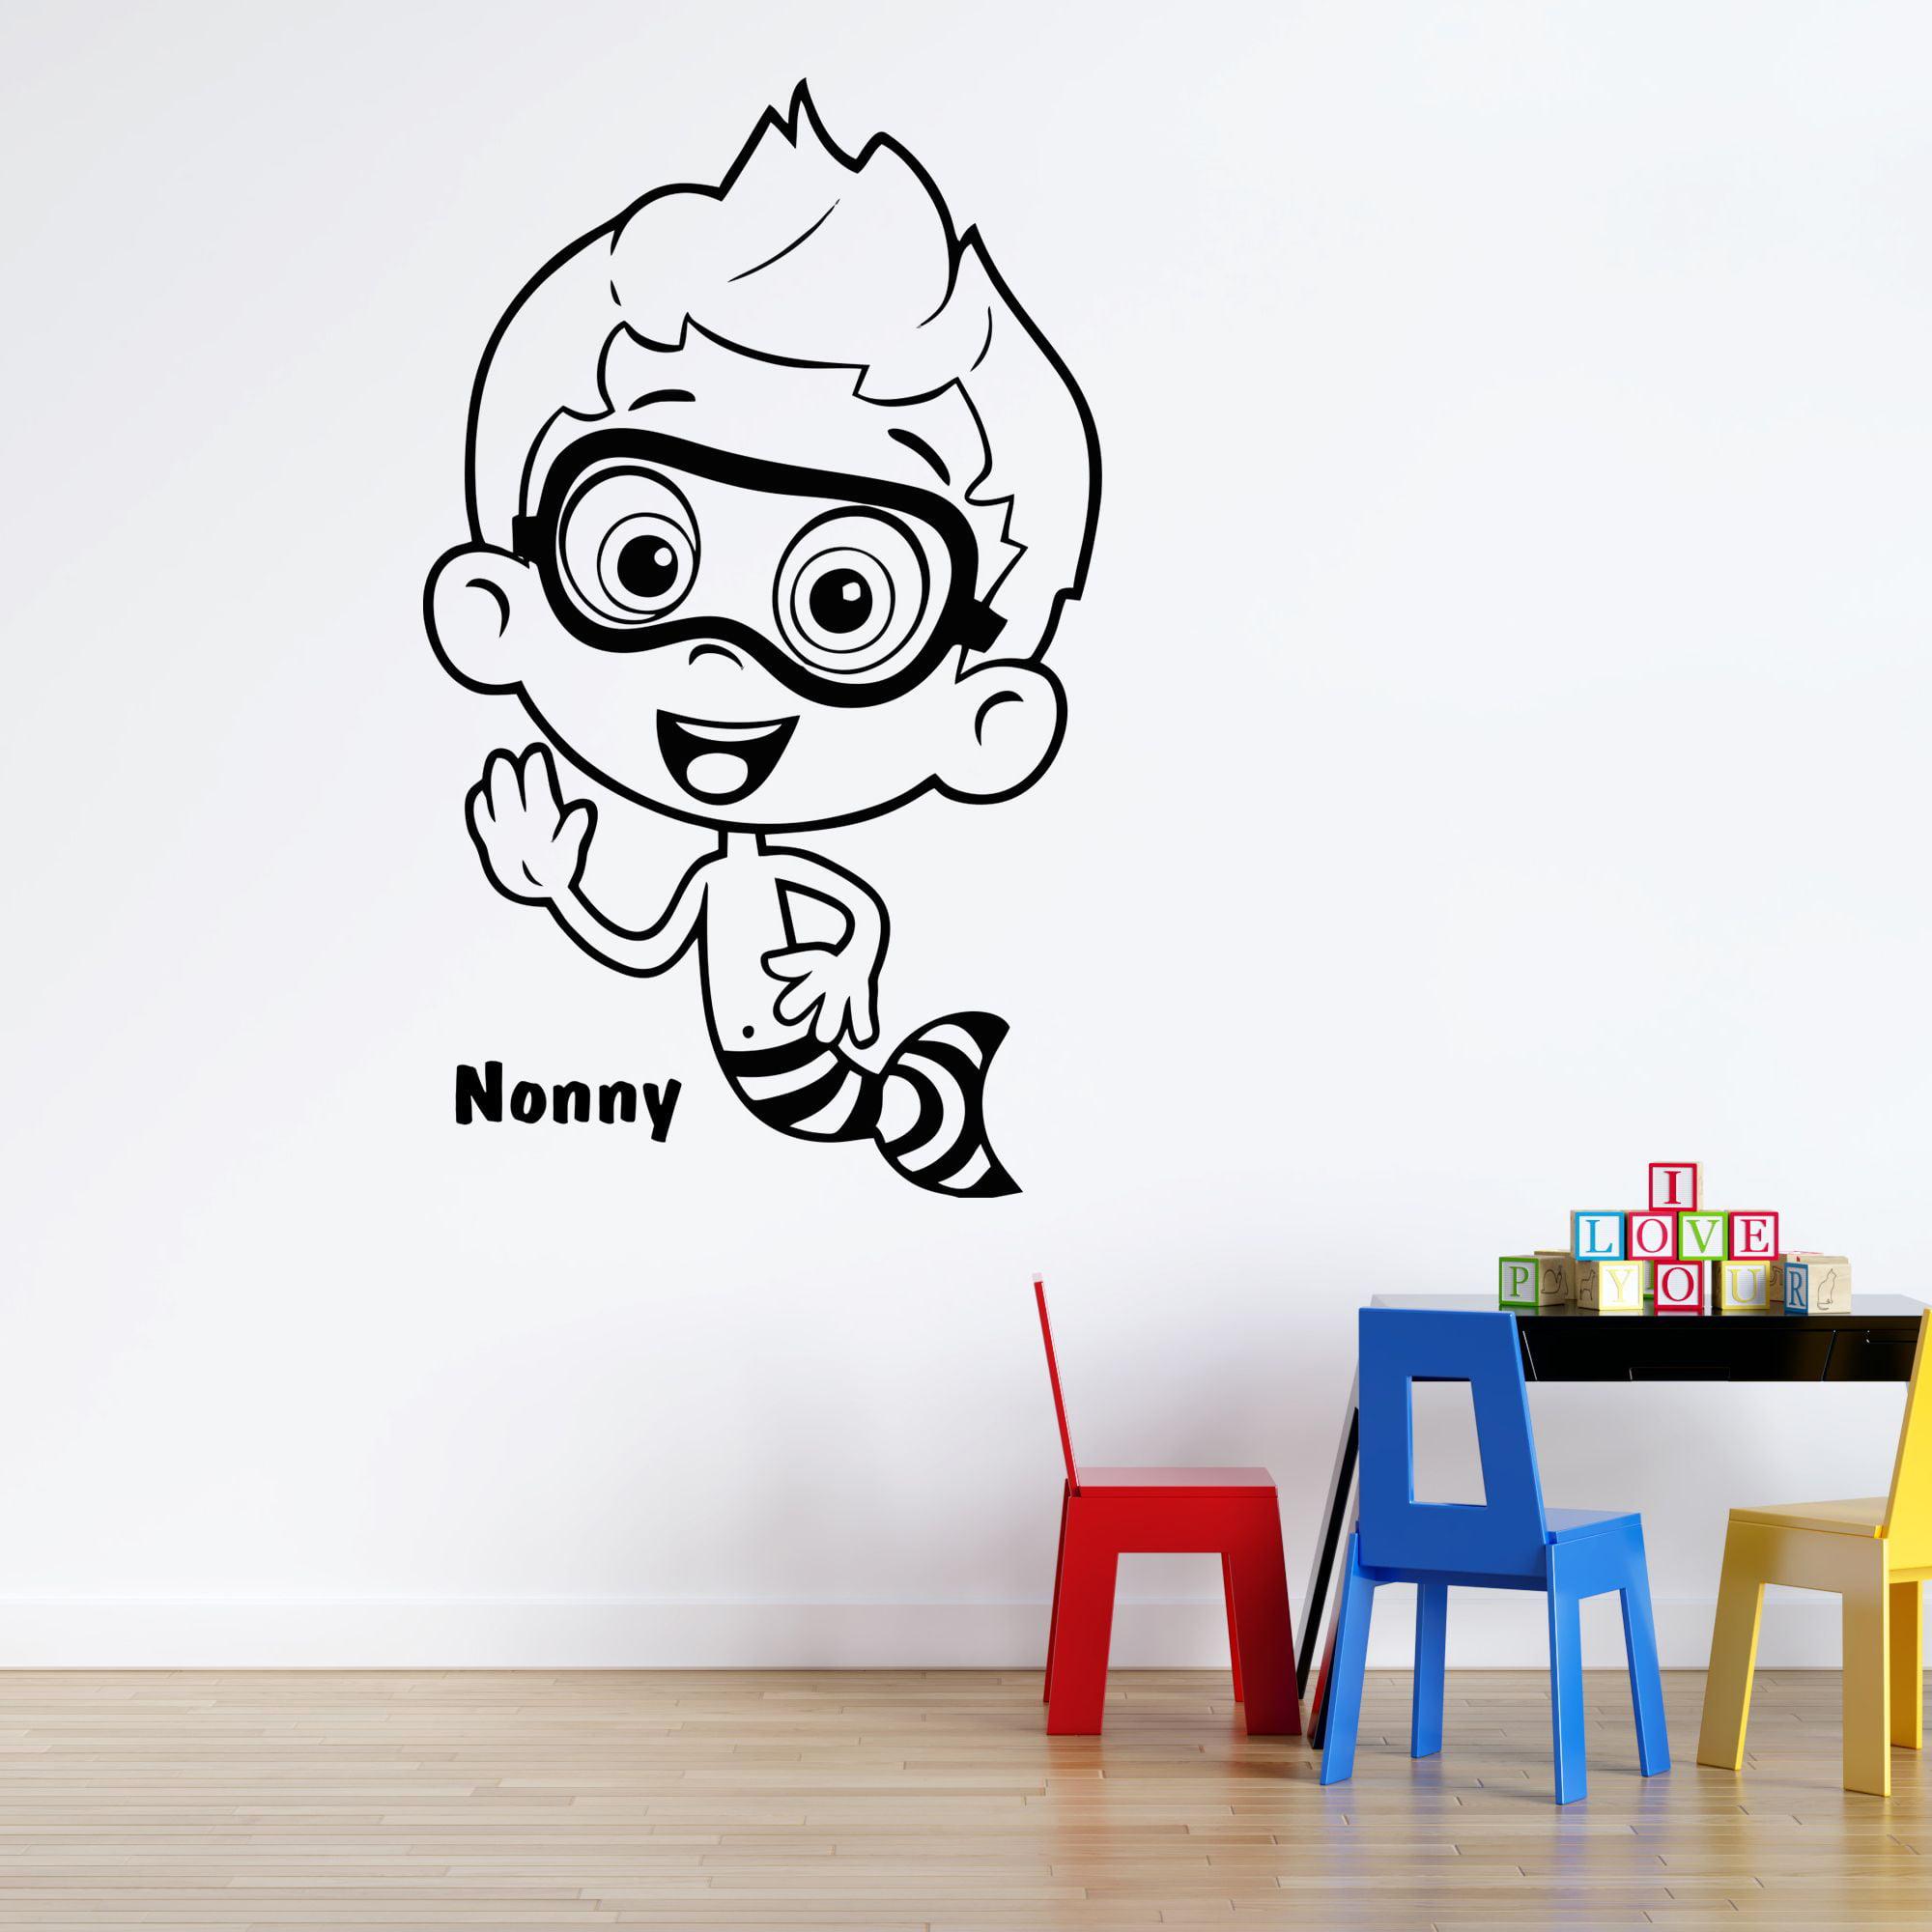 Nonny Bubble Guppies Wall Decal | Kids Bedroom Nursery ...